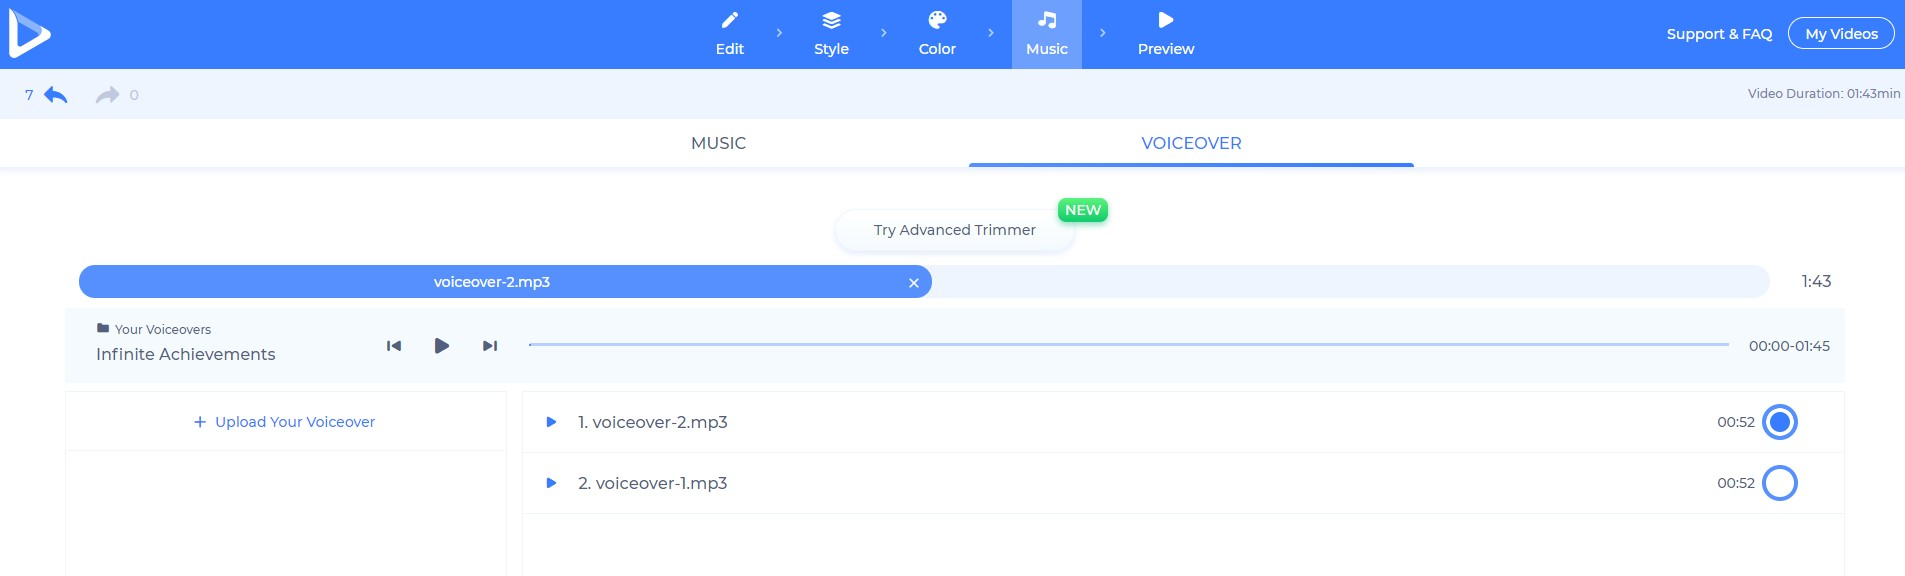 Whiteboard Animation - Add Voiceover